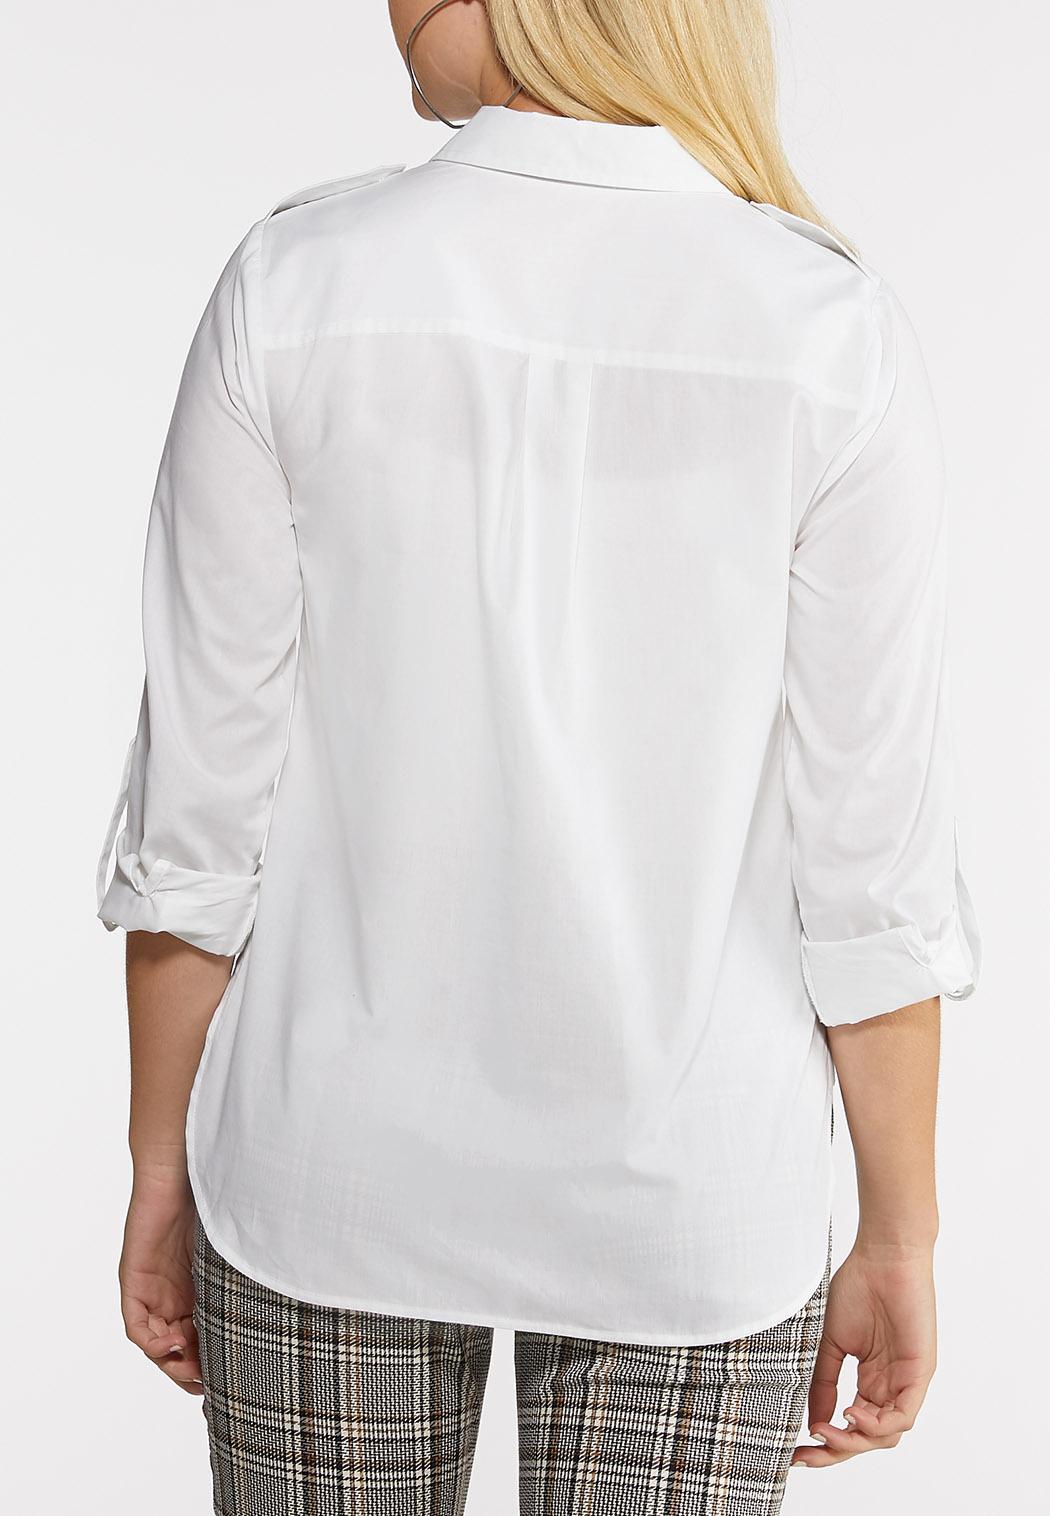 Plus Size White Button Down Shirt (Item #44005161)